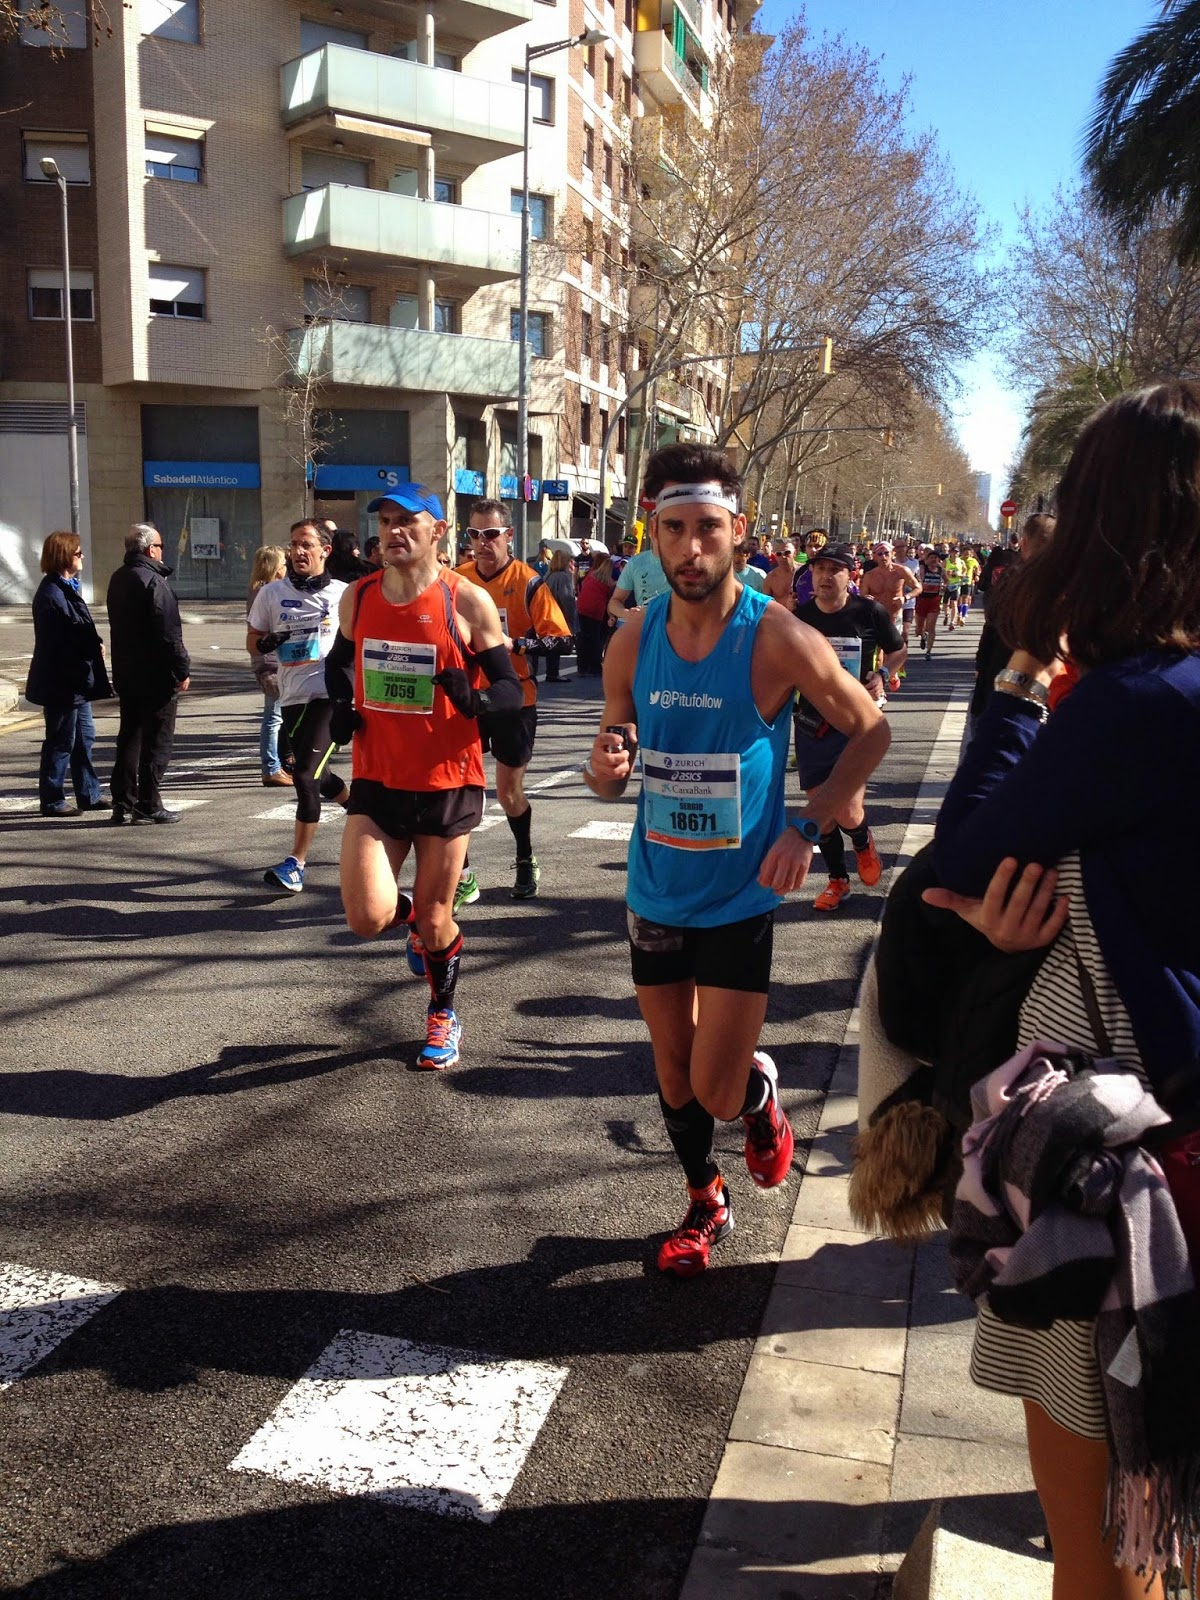 zurich marato barcelona 2015 corredor running